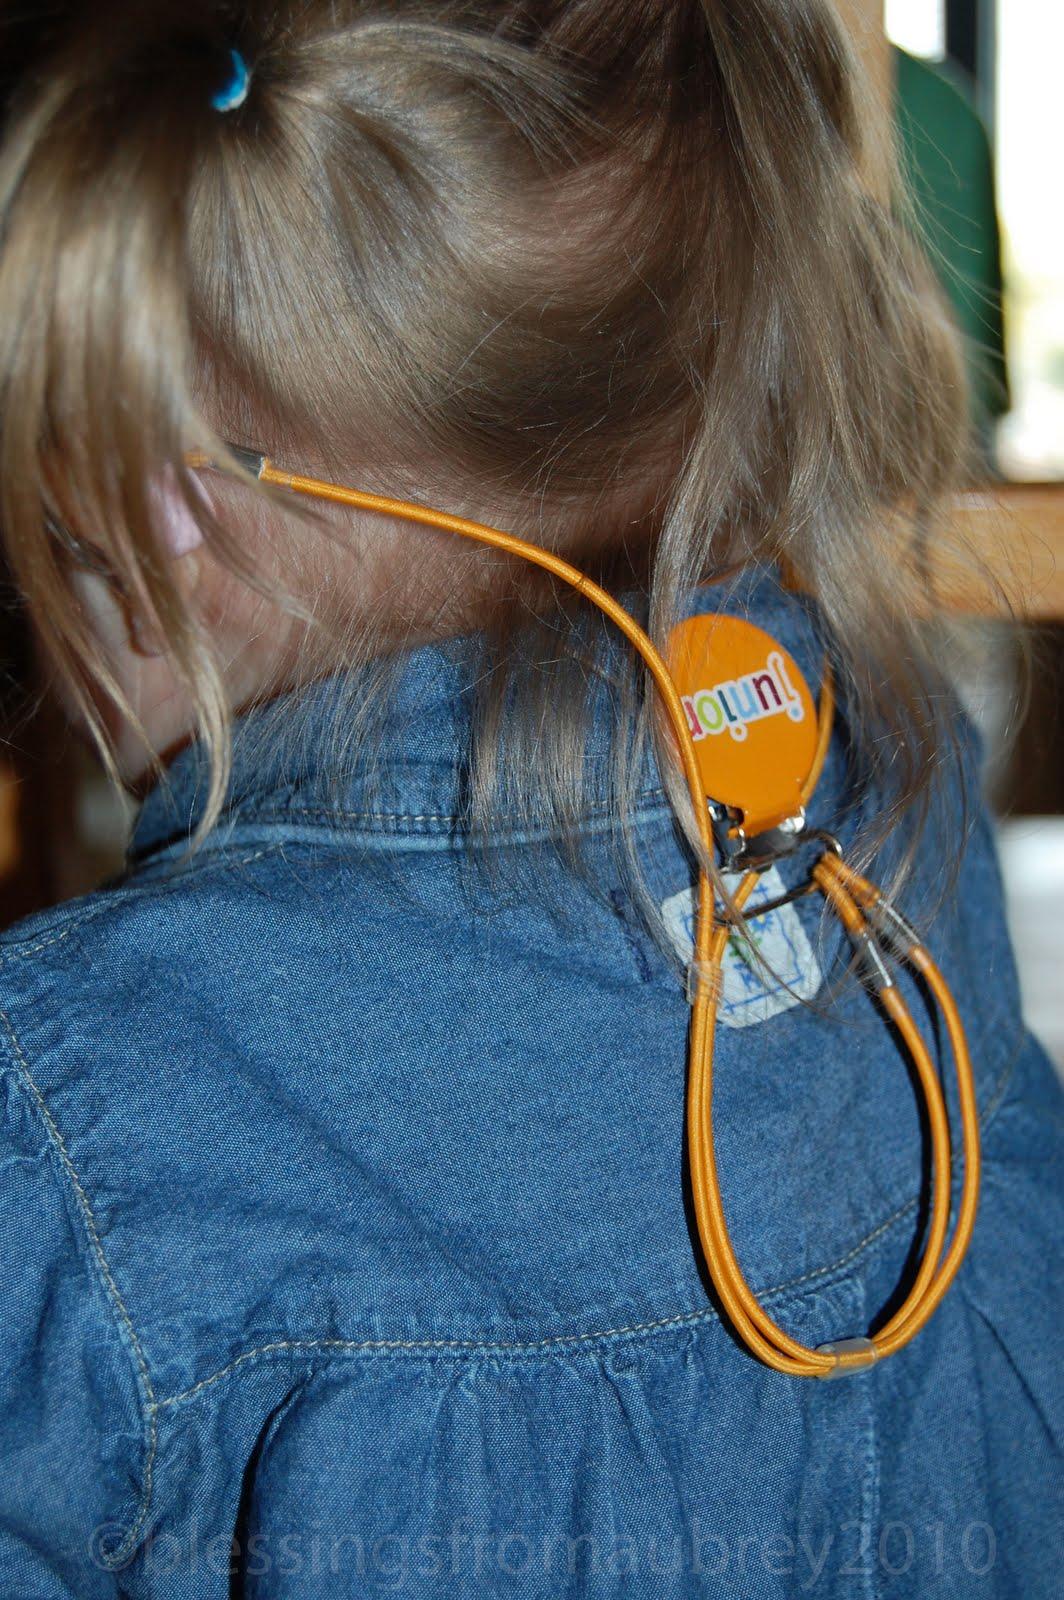 http://2.bp.blogspot.com/_YP5aFADyODQ/TIr5XltMIPI/AAAAAAAABlw/v7W83Mos-I0/s1600/Hearing-Aid-Strap.jpg